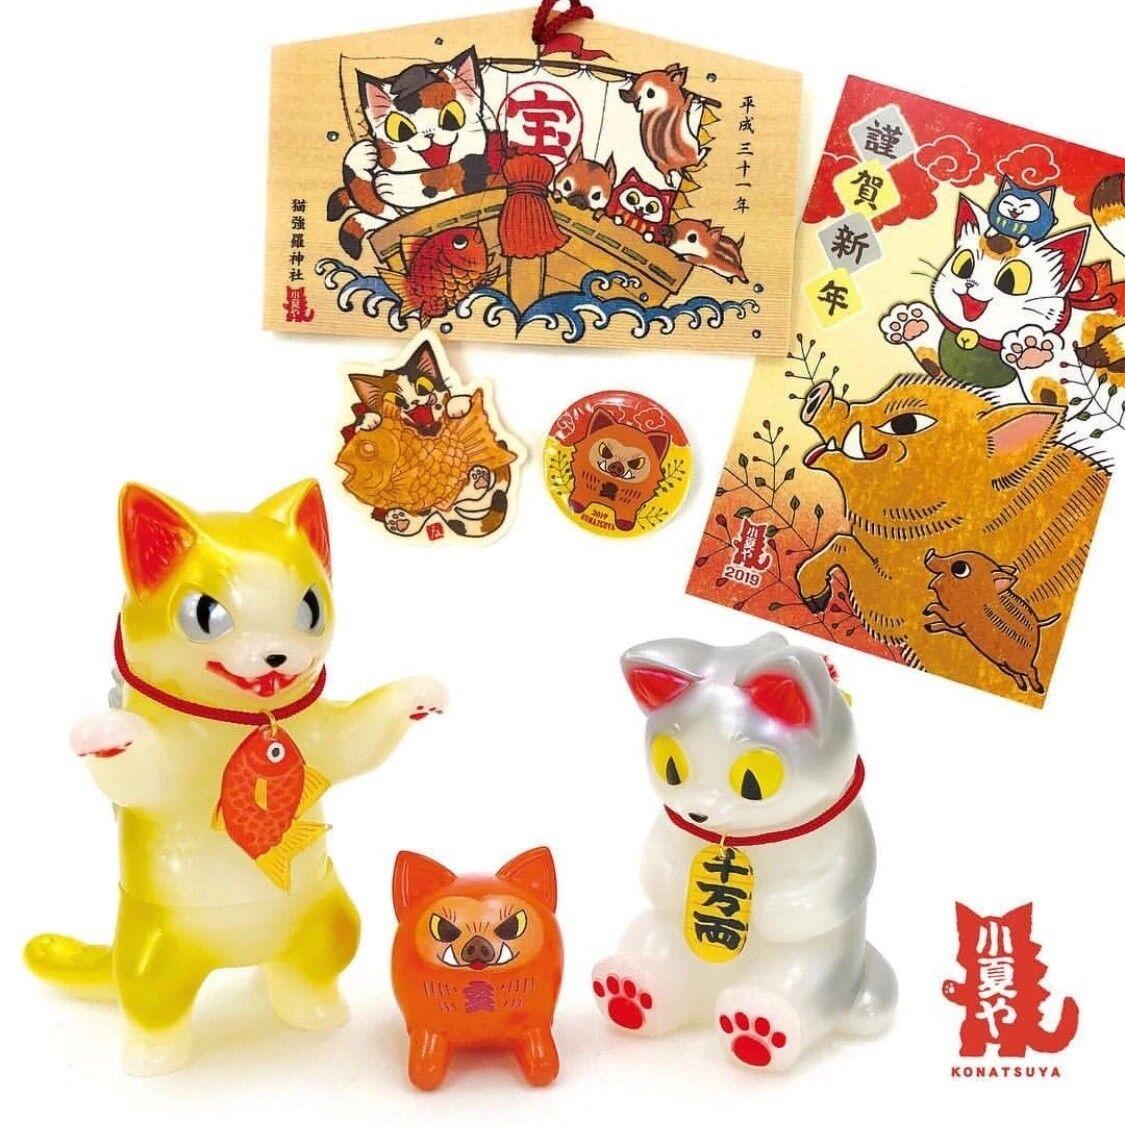 Konatsuya Konatsu nuovo  Year Happy borsa 2019 Negora Daruma Ema Post autod  ordina ora con grande sconto e consegna gratuita